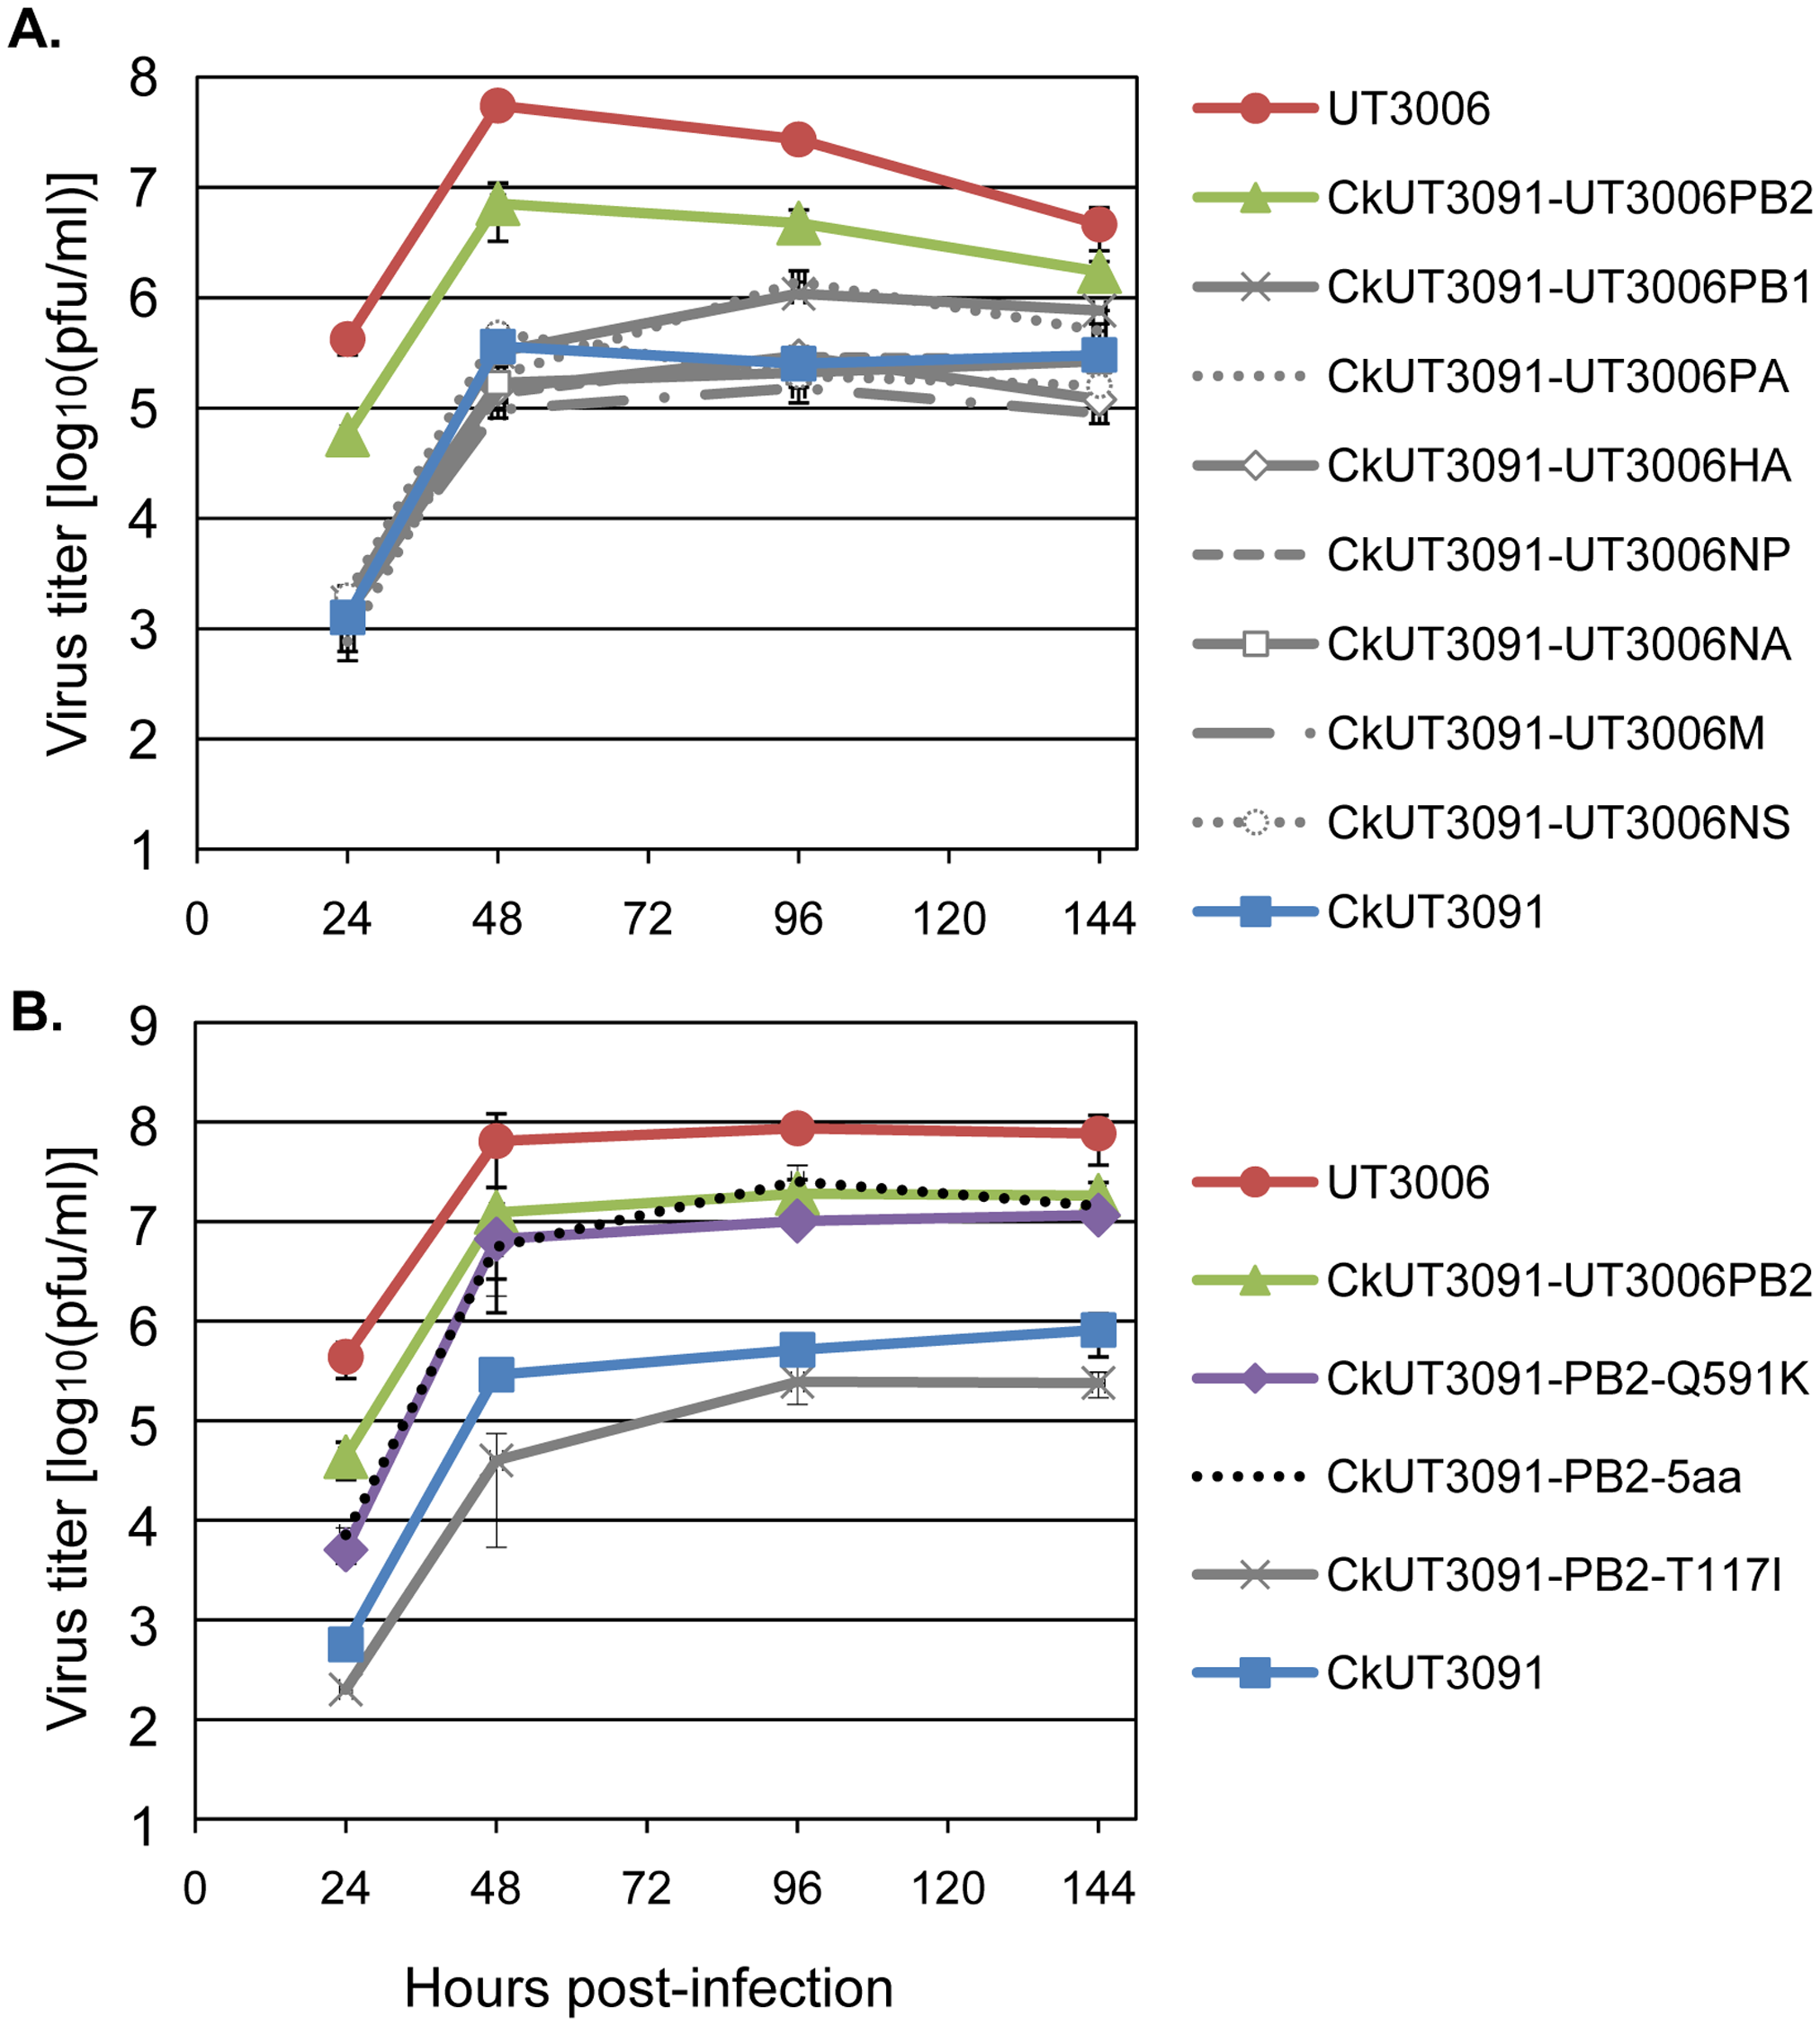 Amino acid PB2-591 is important for H5N1 virus replication in mammalian cells.